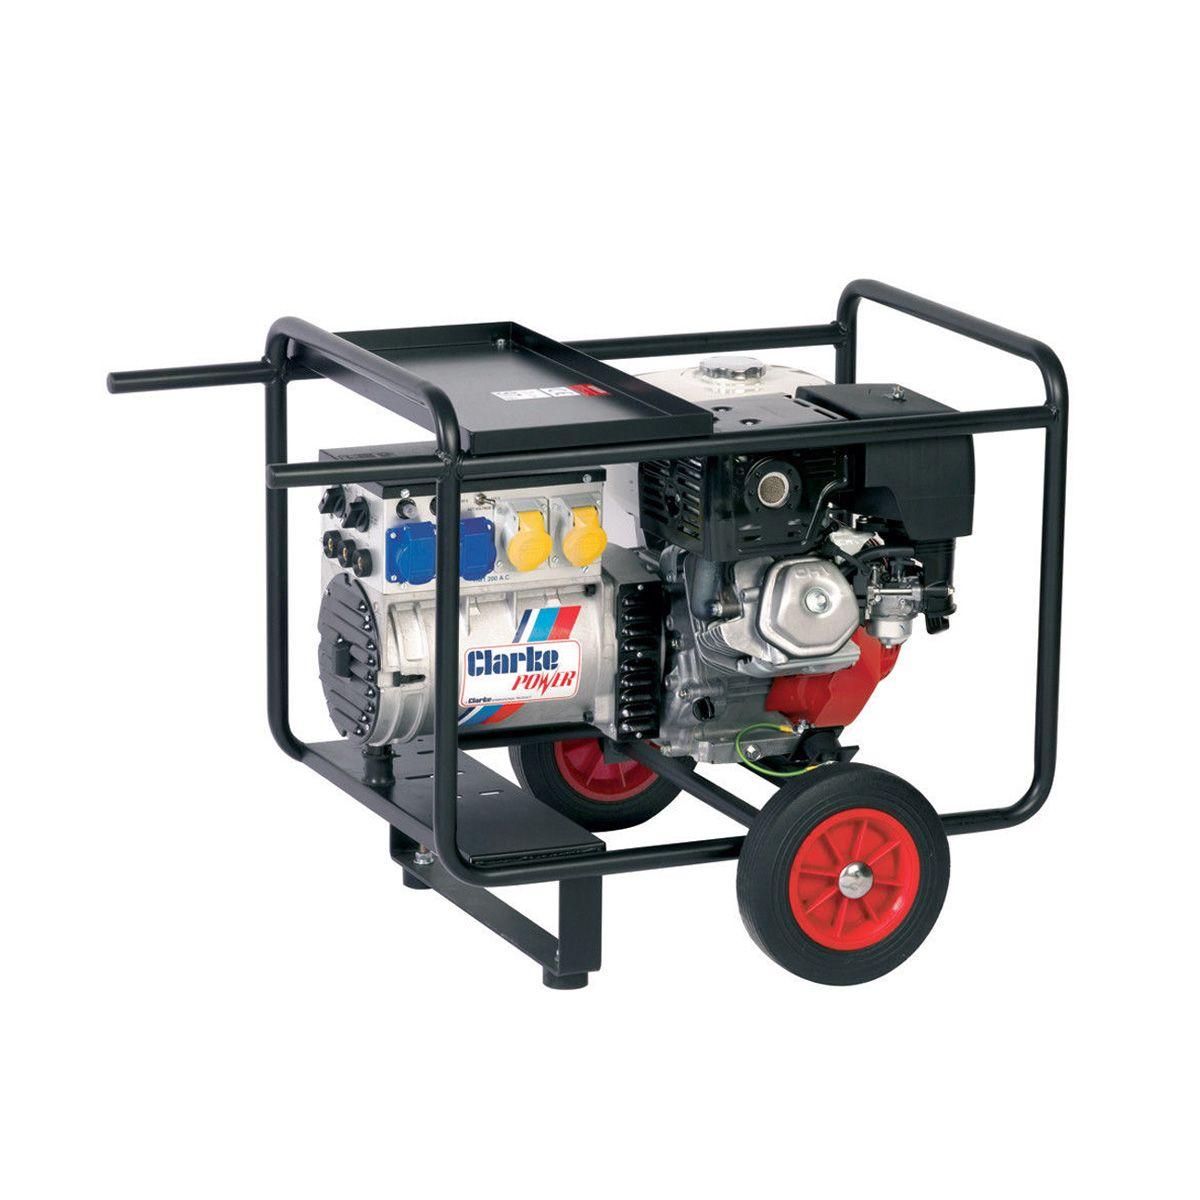 Clarke WH215 Honda Petrol Engine Driven Welder Generator 6.5kVA 240V  #A52826